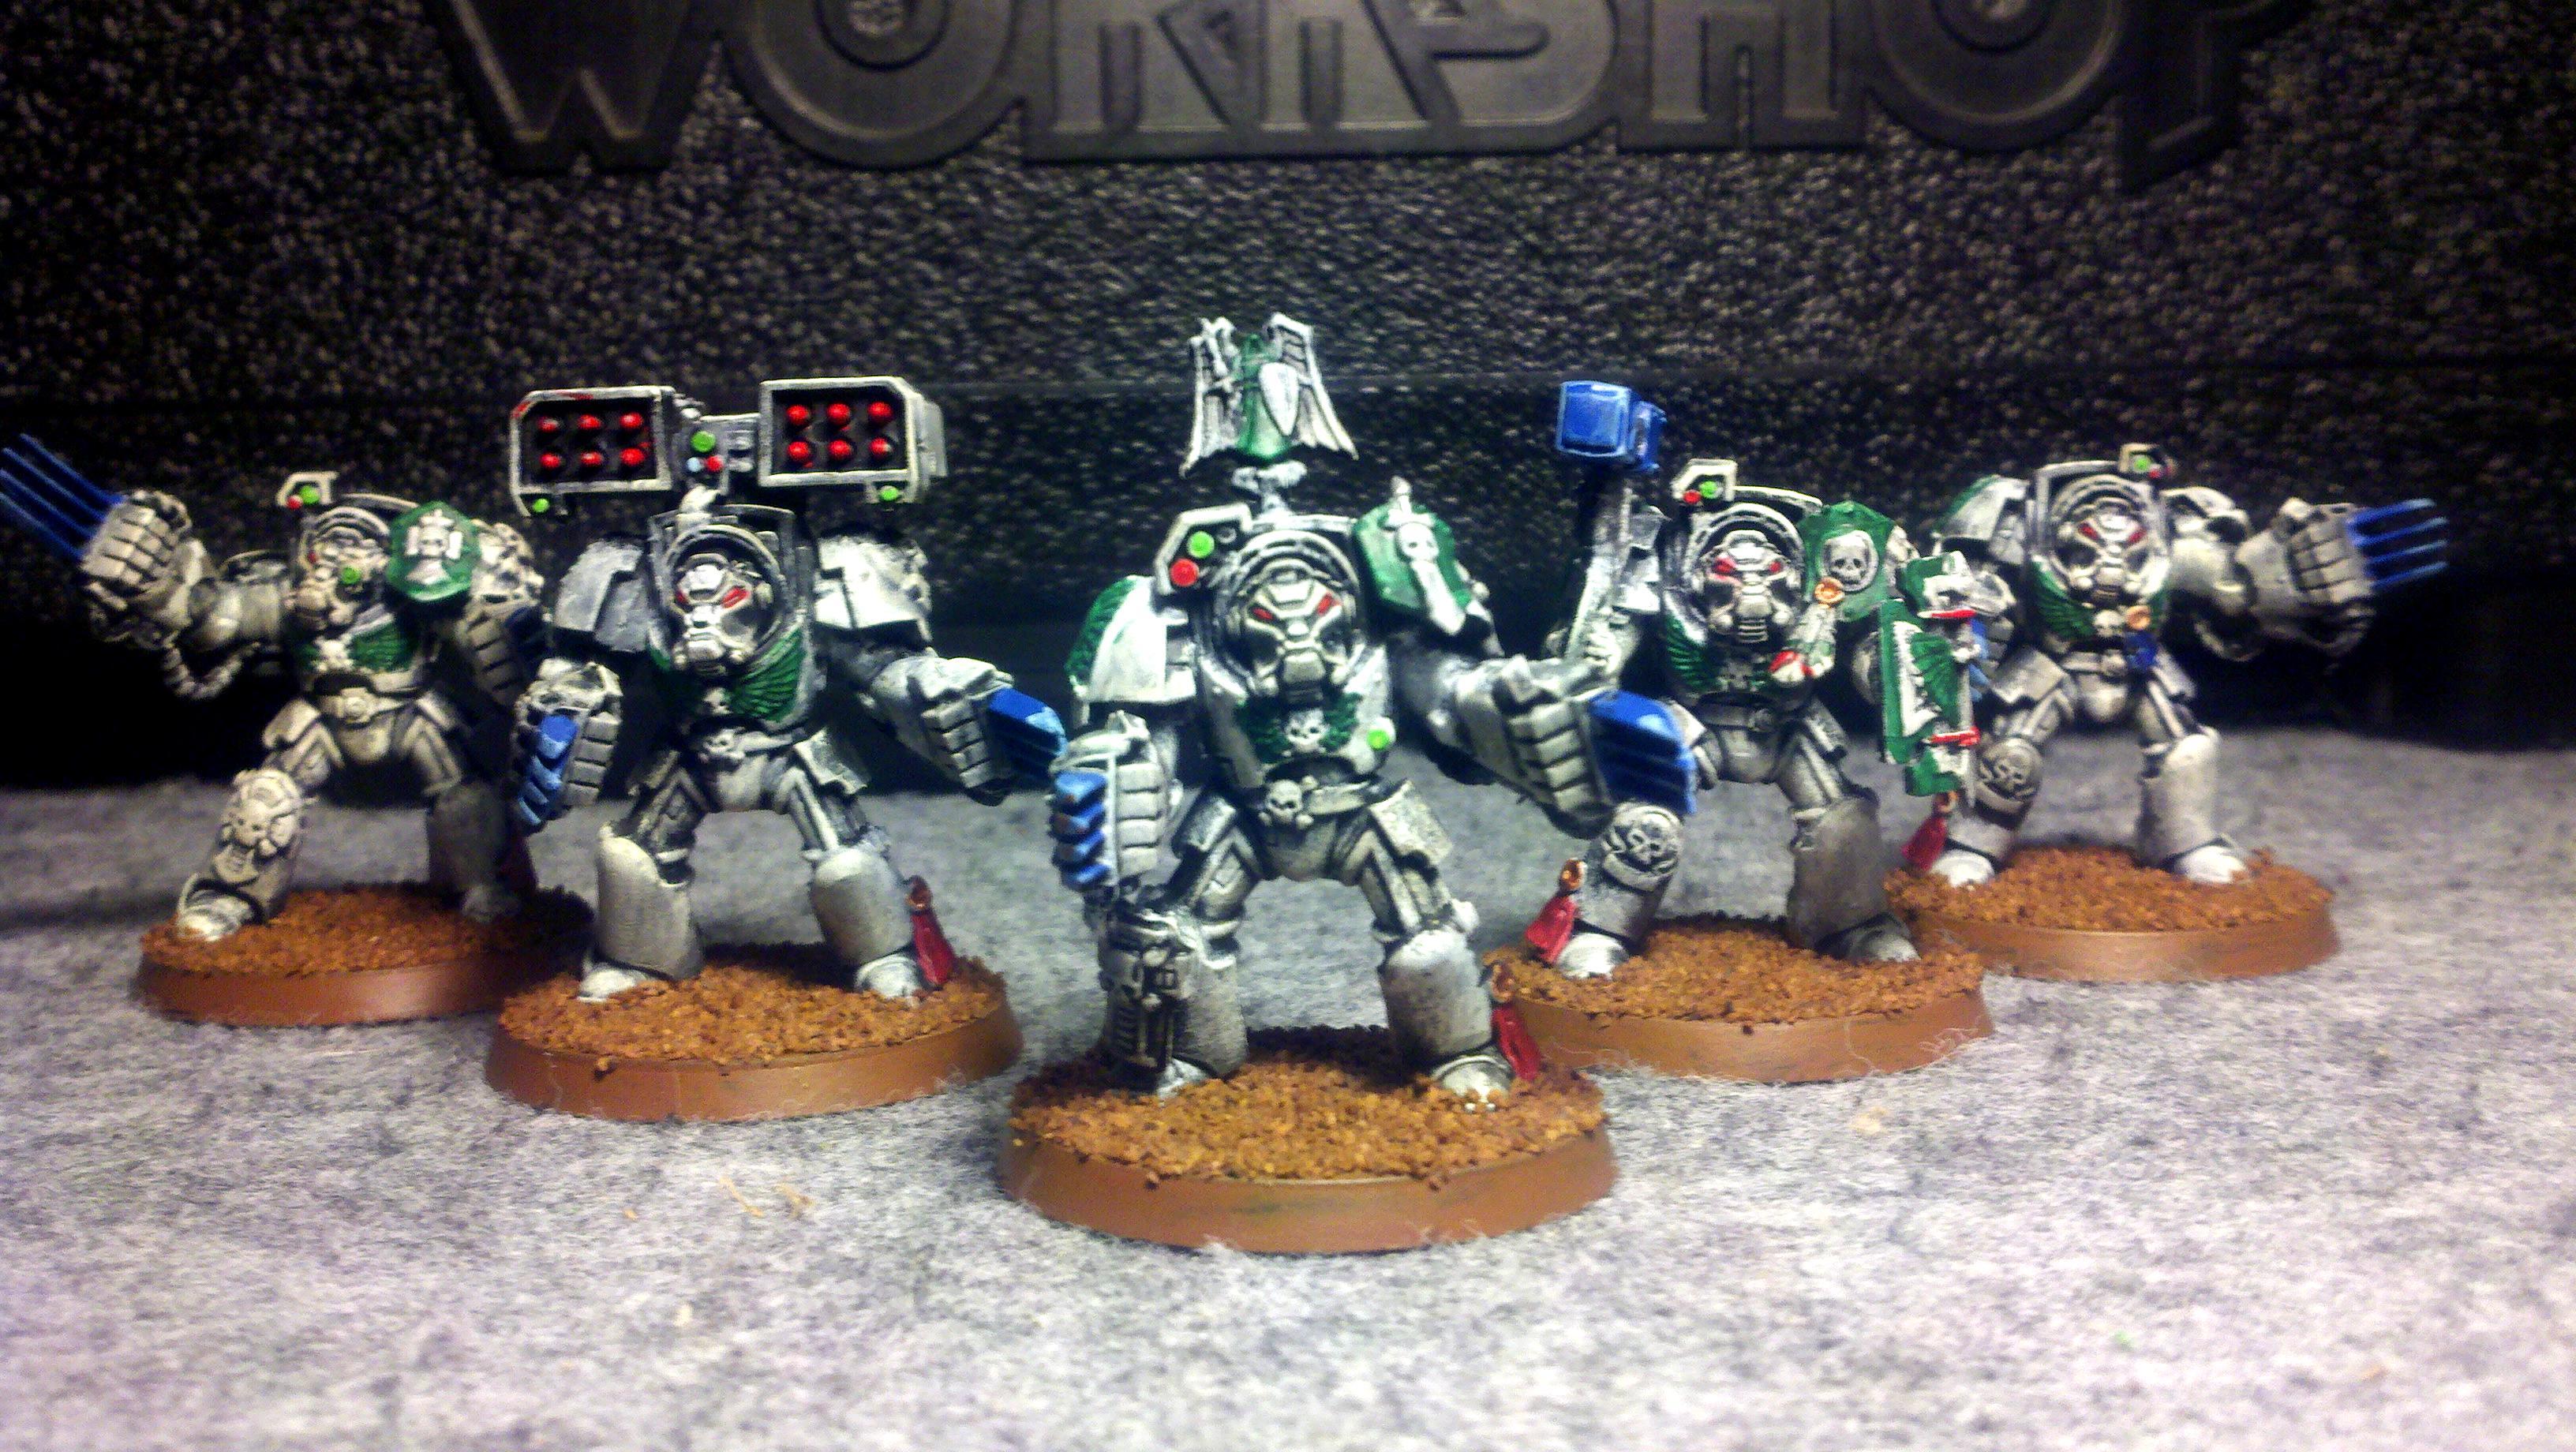 Deathwing, Space Marines, Terminator Armor, Warhammer 40,000